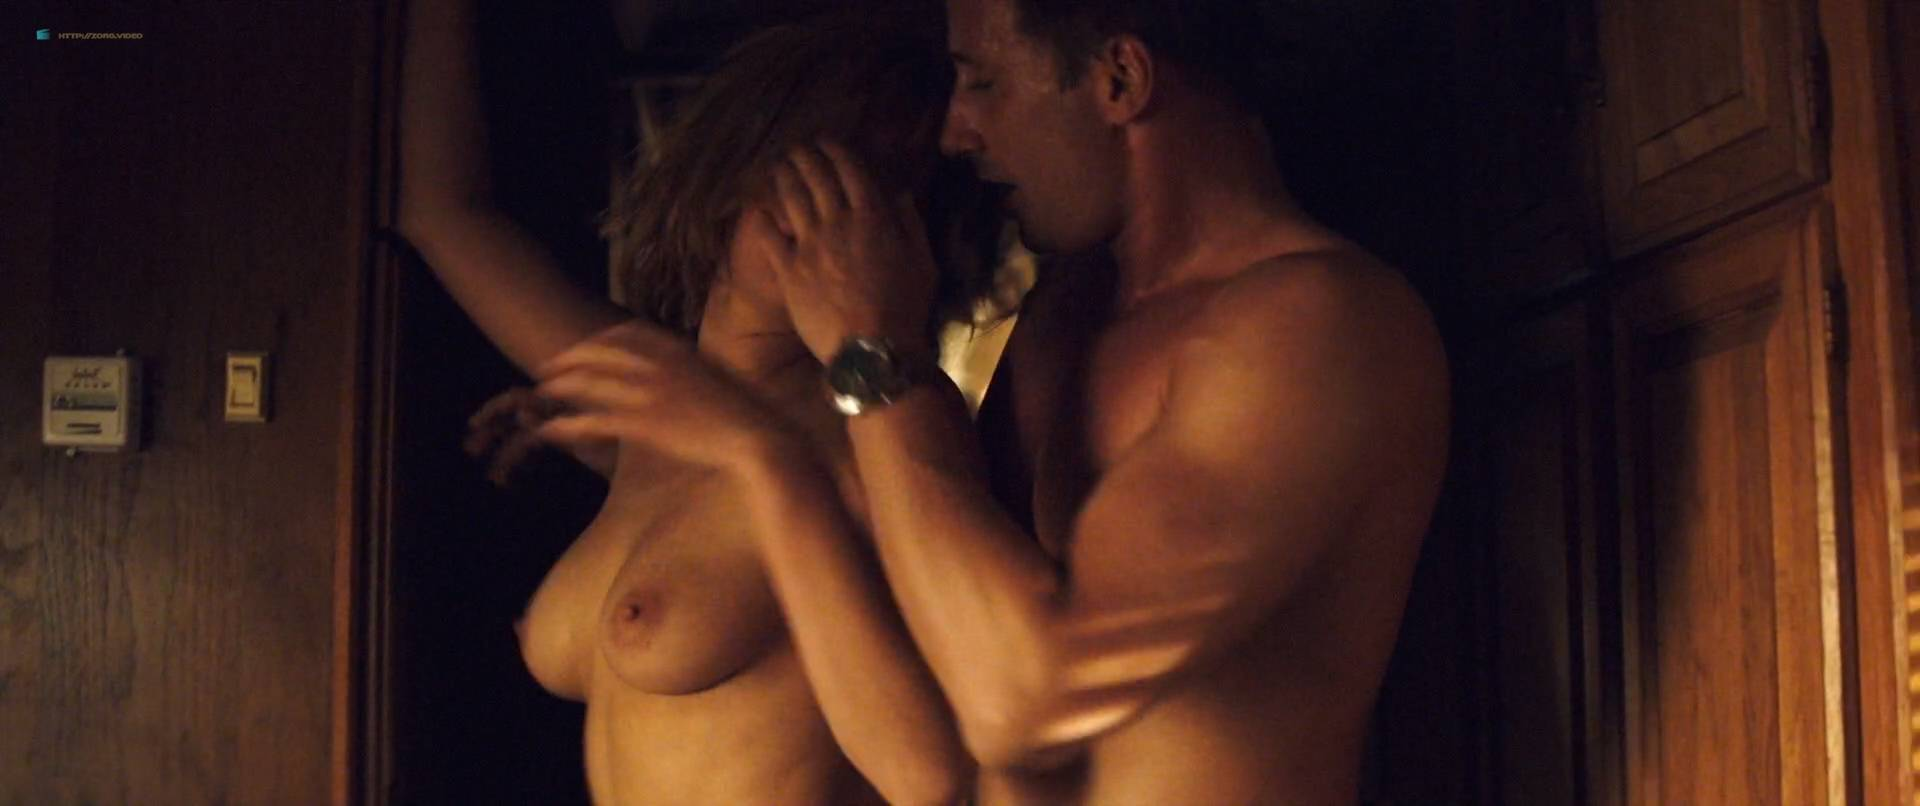 Adele exarchopoulos nude sex scene in le fidele 6